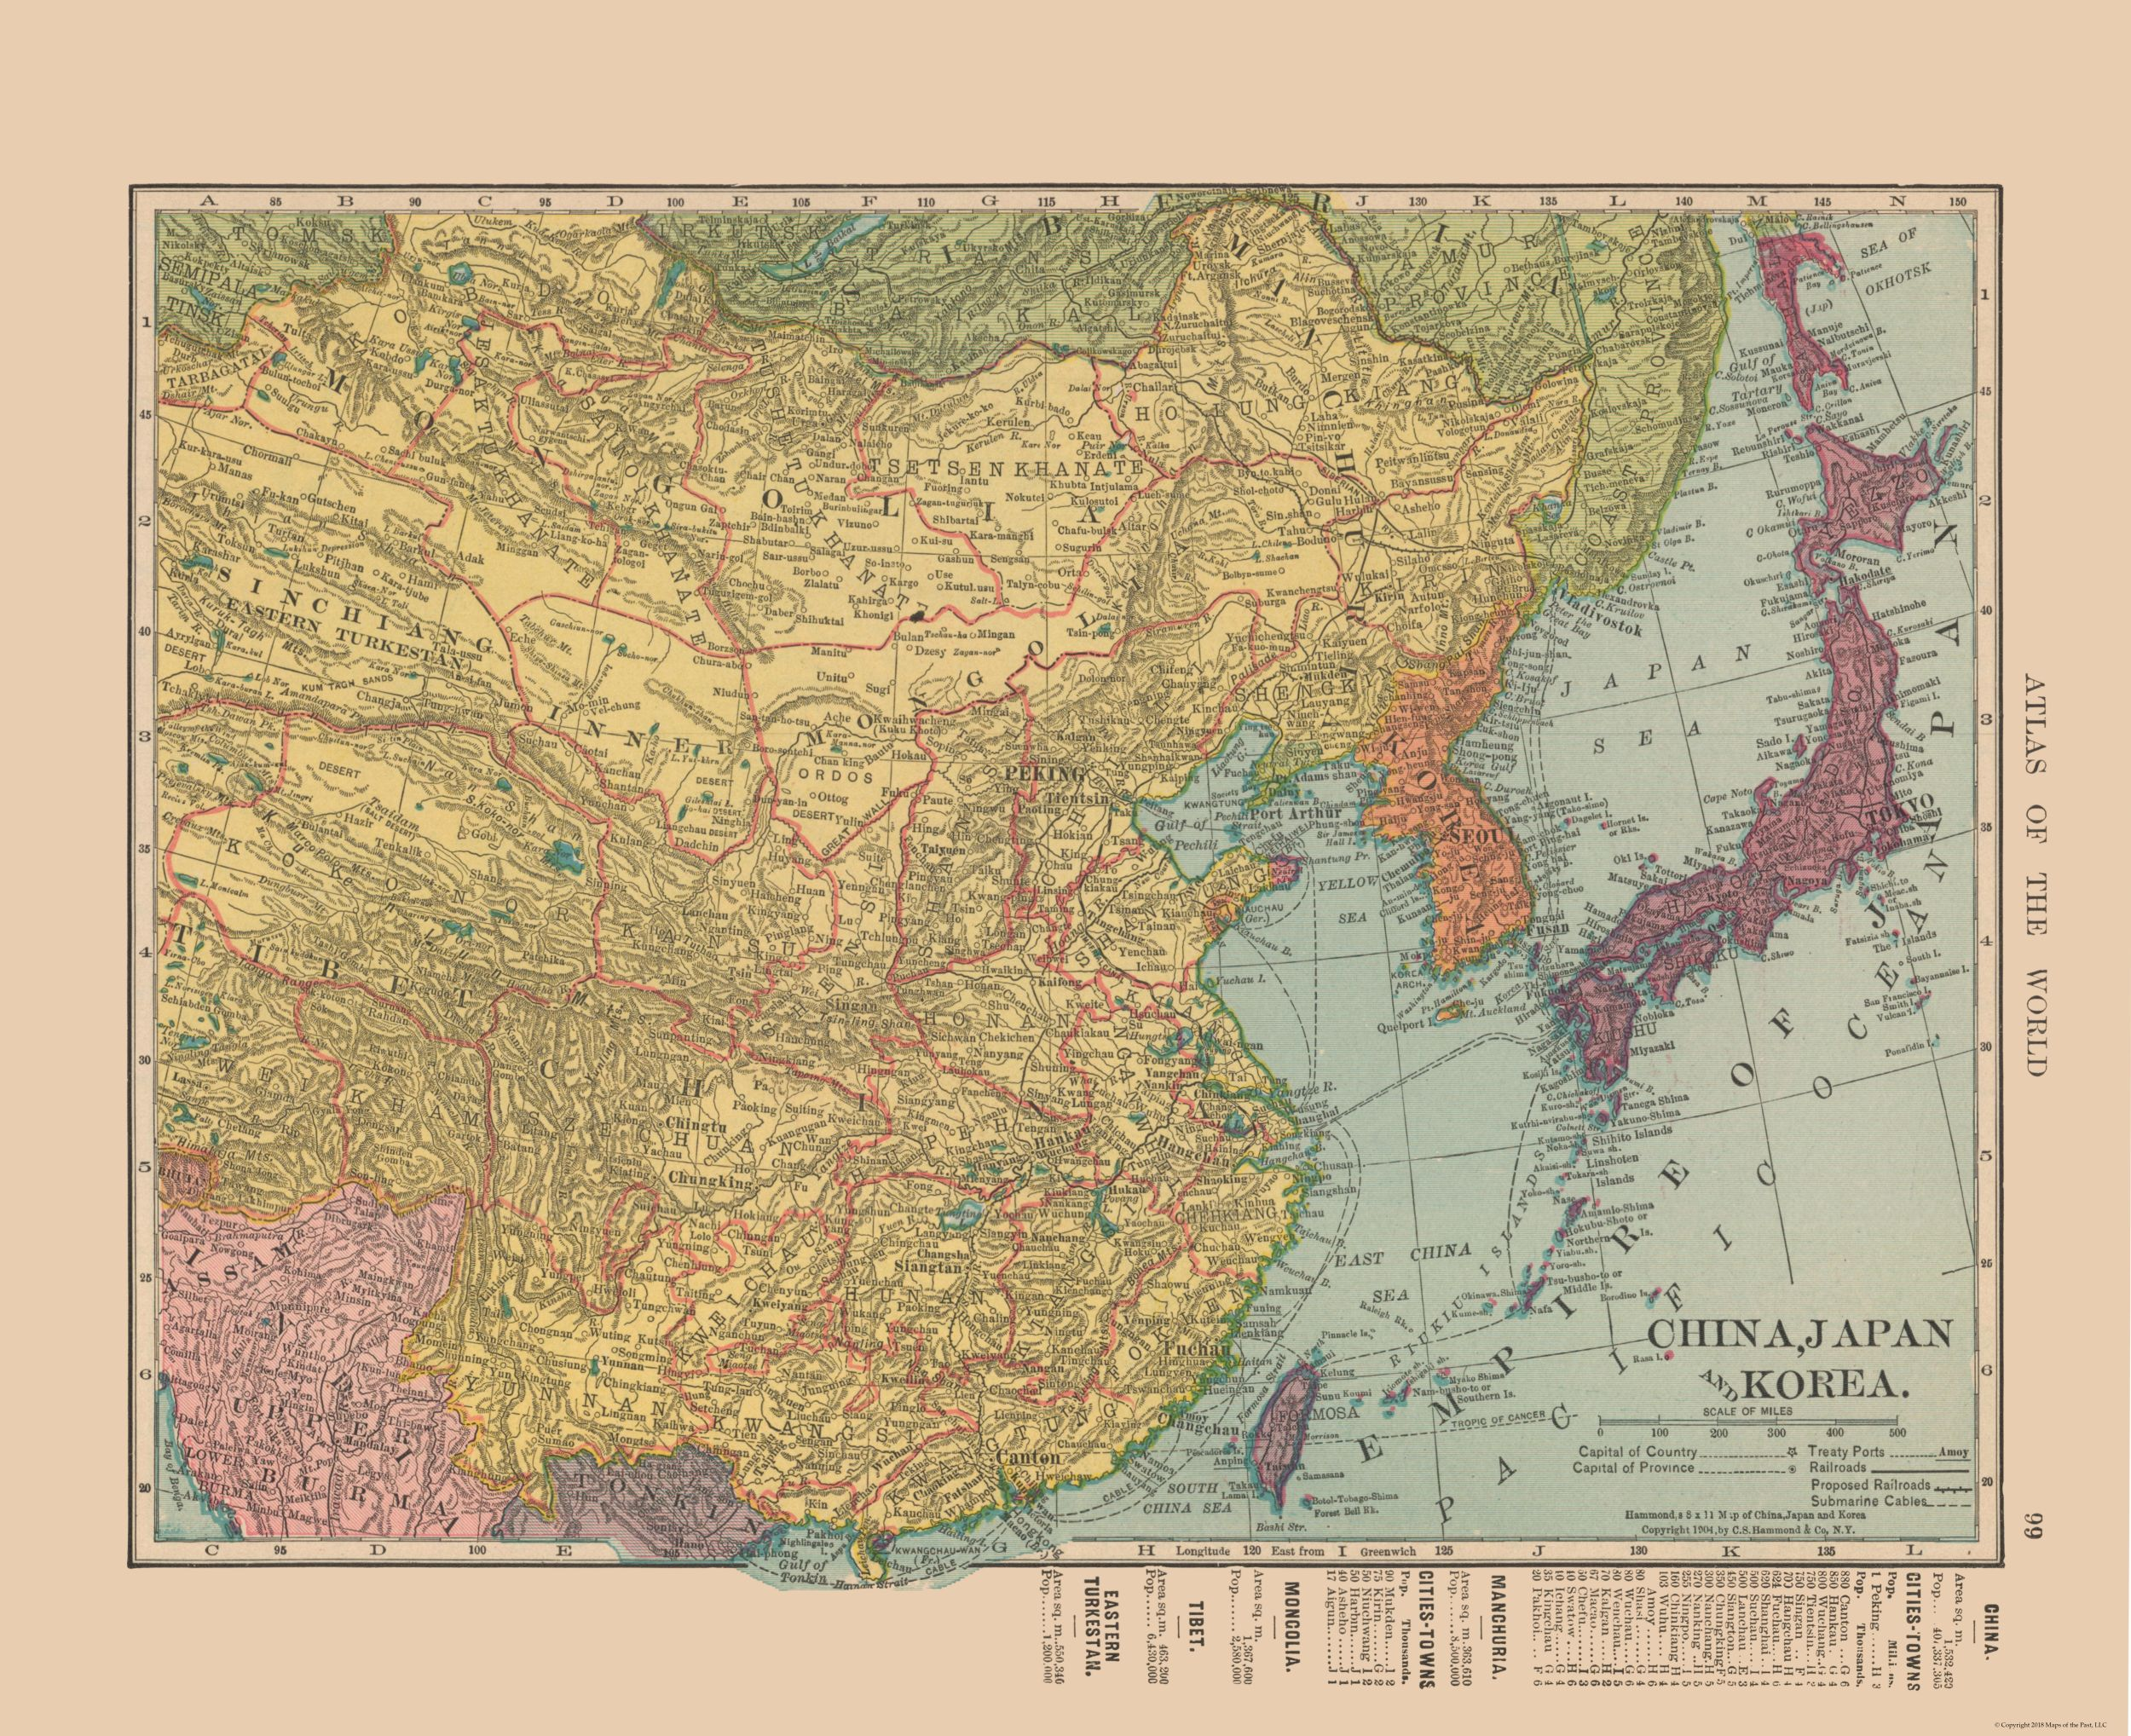 International Map - China, Japan, Korea - Hammond's Atlas 1910 - 28.23 on coloring map of japan, climate zone map of japan, natural gas map of japan,